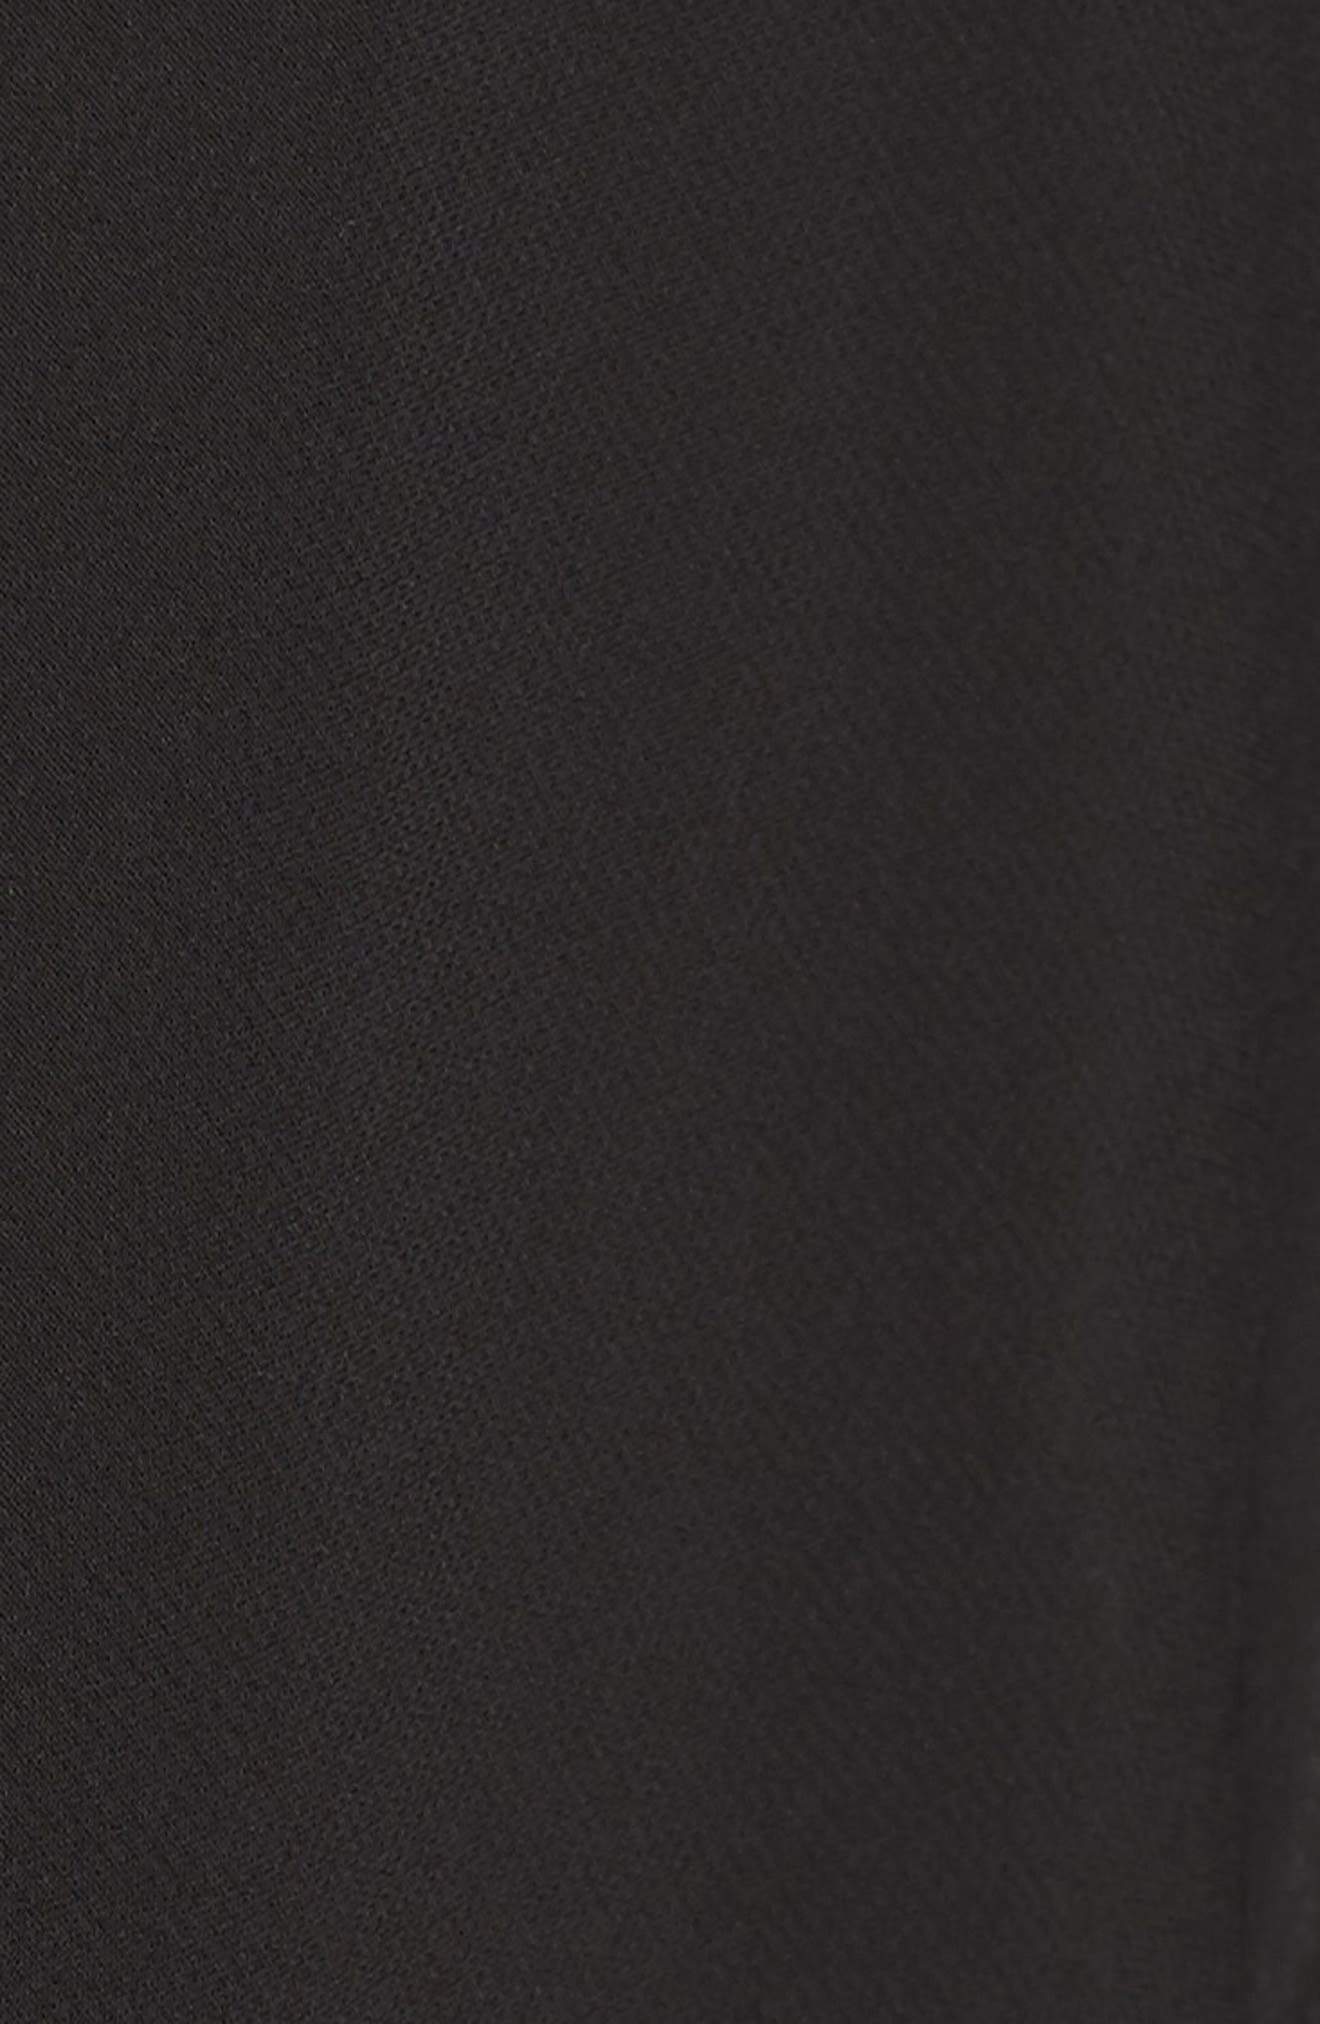 Chiffon Bolero,                             Alternate thumbnail 5, color,                             Black